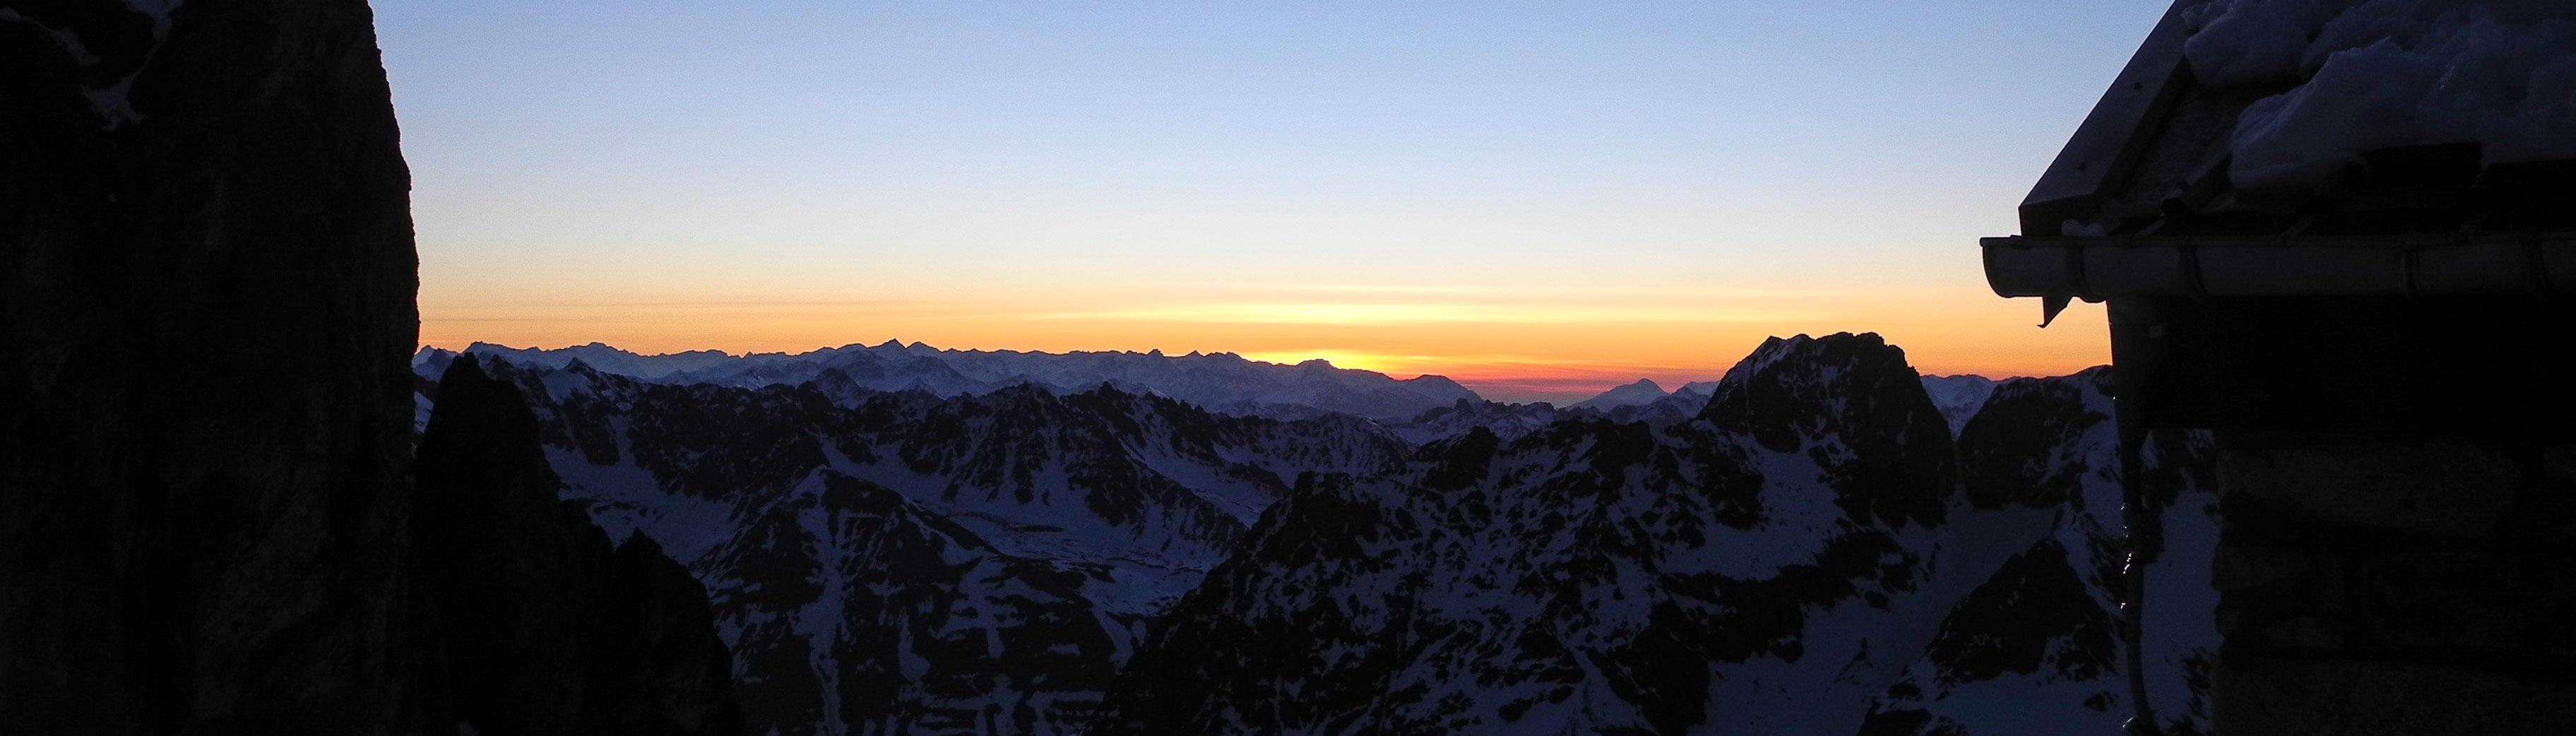 Skitour Dauphine Bergführer